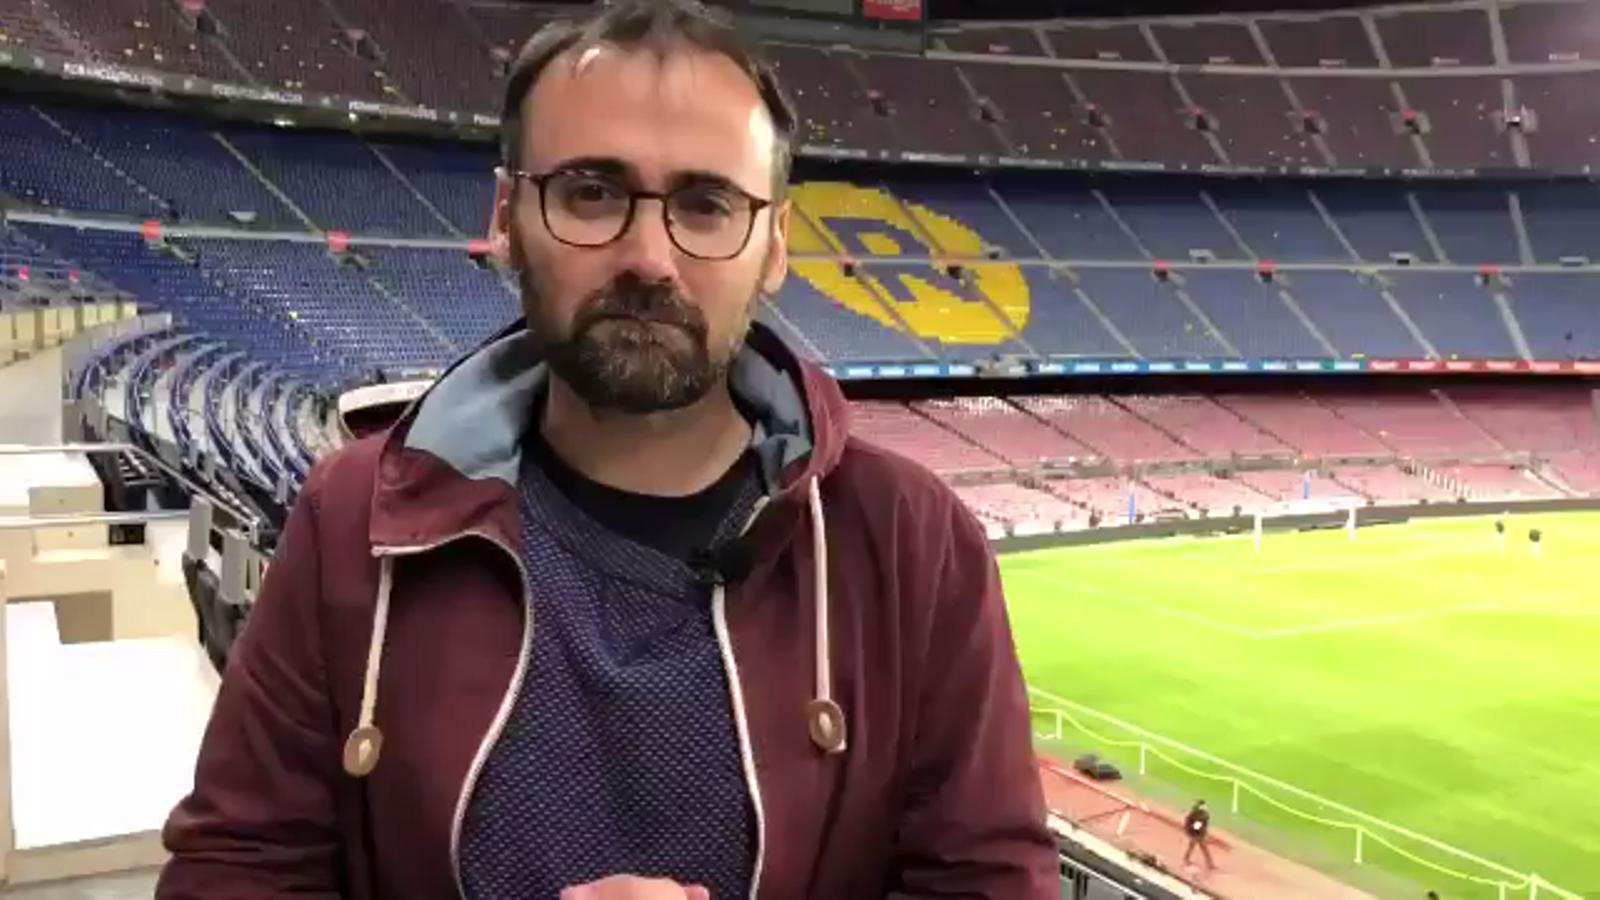 L'anàlisi de Toni Padilla del Barça 5-1 Madrid